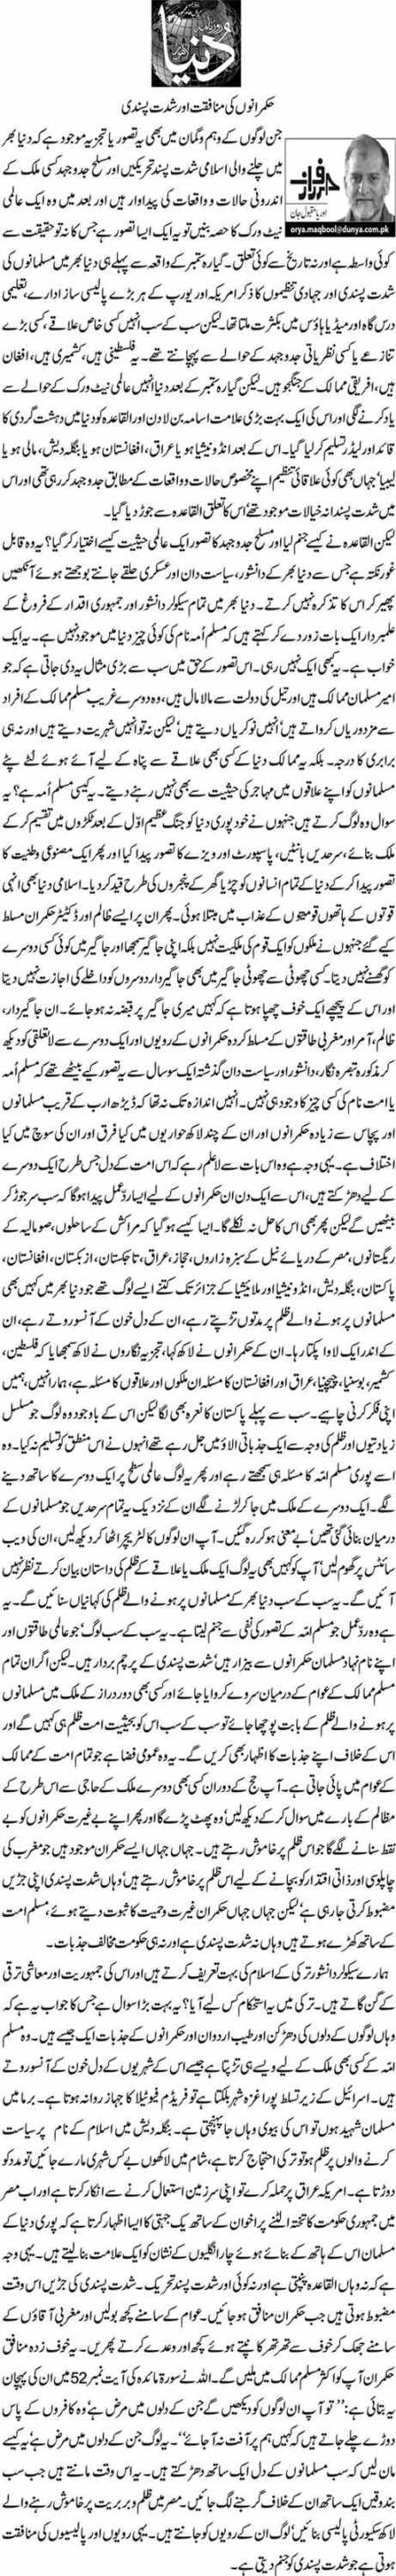 Hukamranun Ki Munafkat Aur Shidat Pasandi - Orya Maqbool Jan